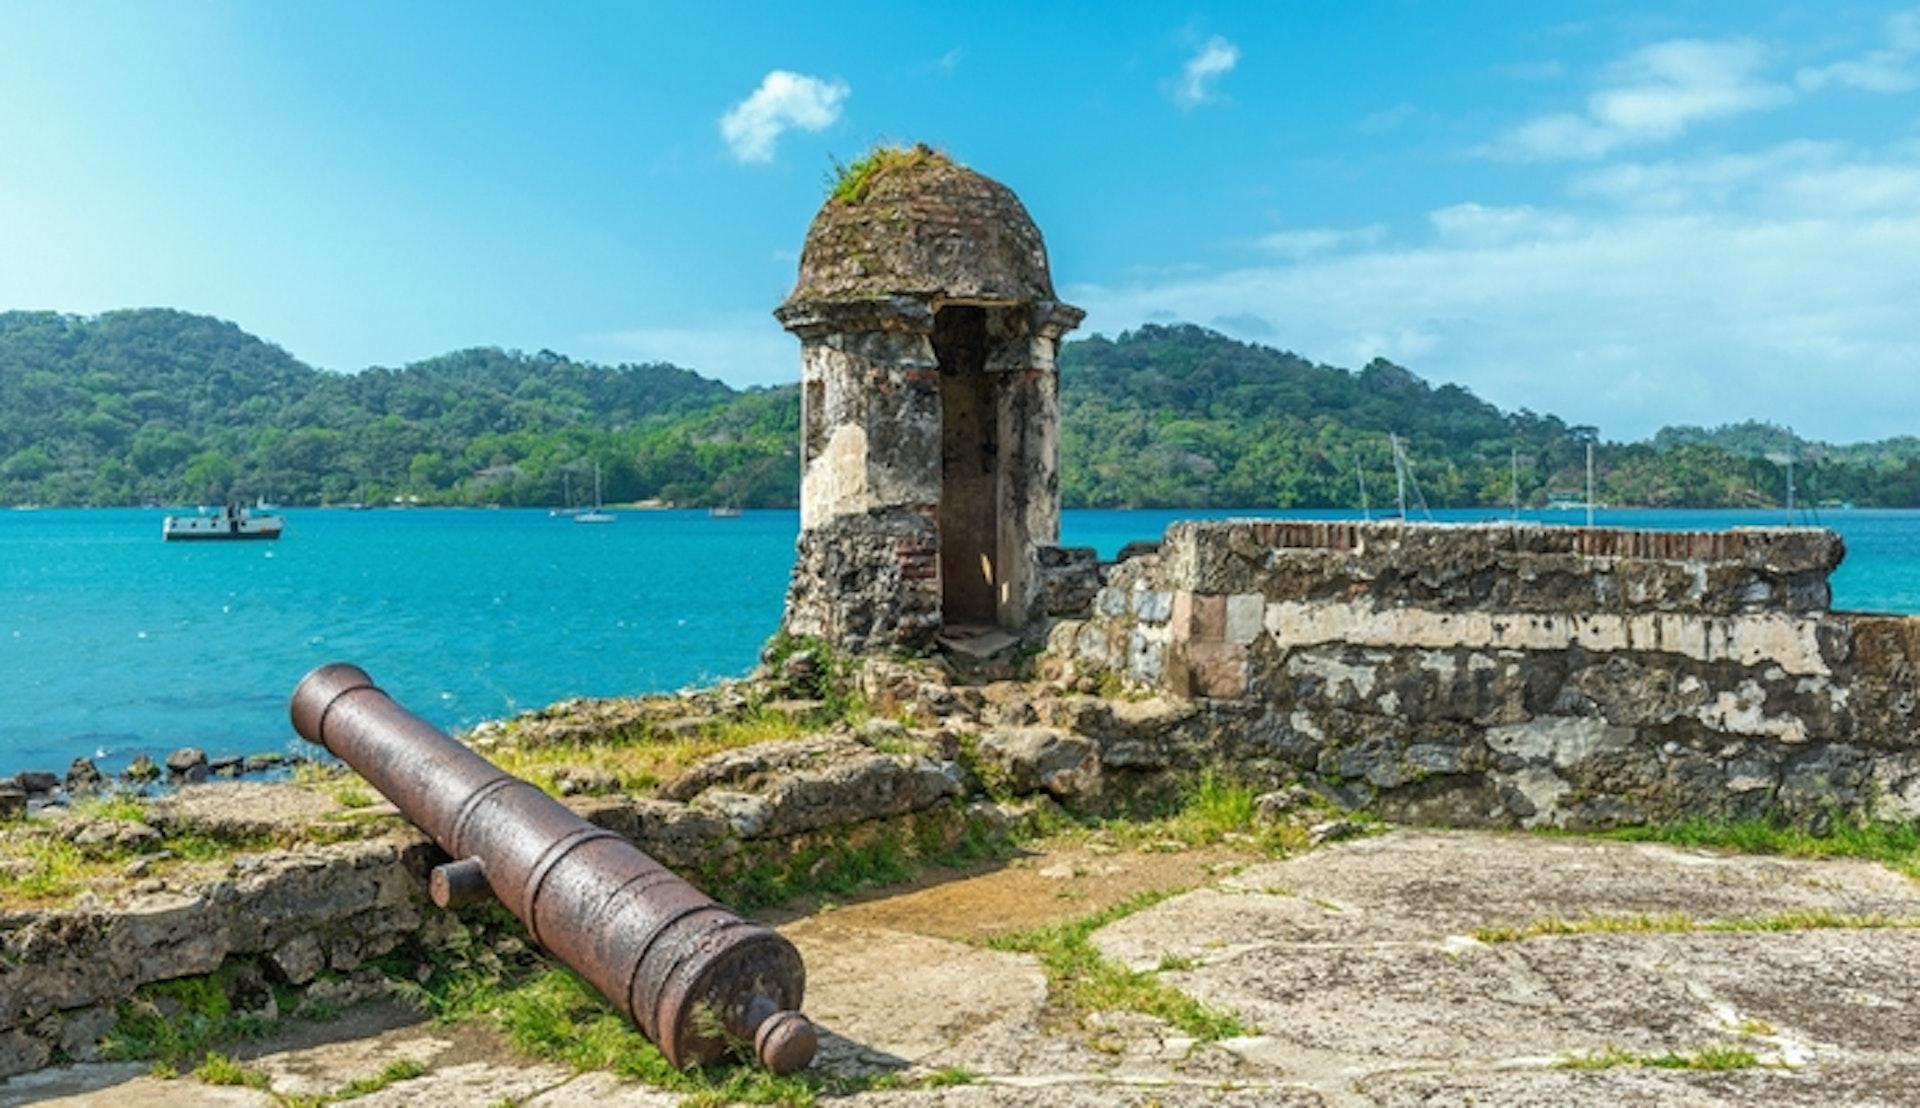 Kryssning panamakanalen och karibien